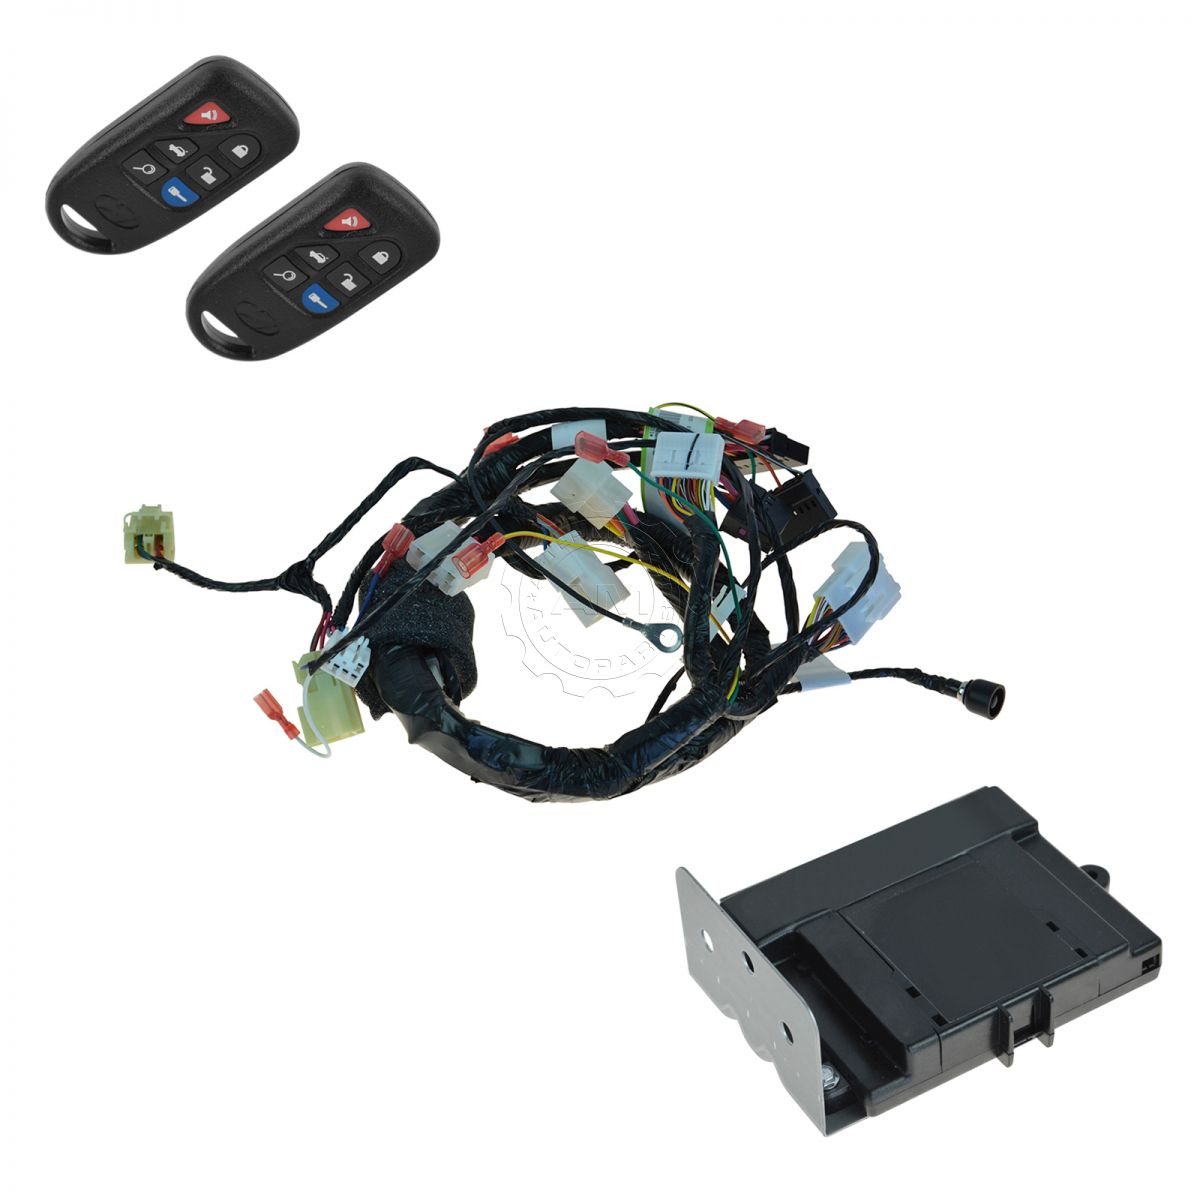 OEM Remote Starter System Kit For 11-13 Hyundai Sonata